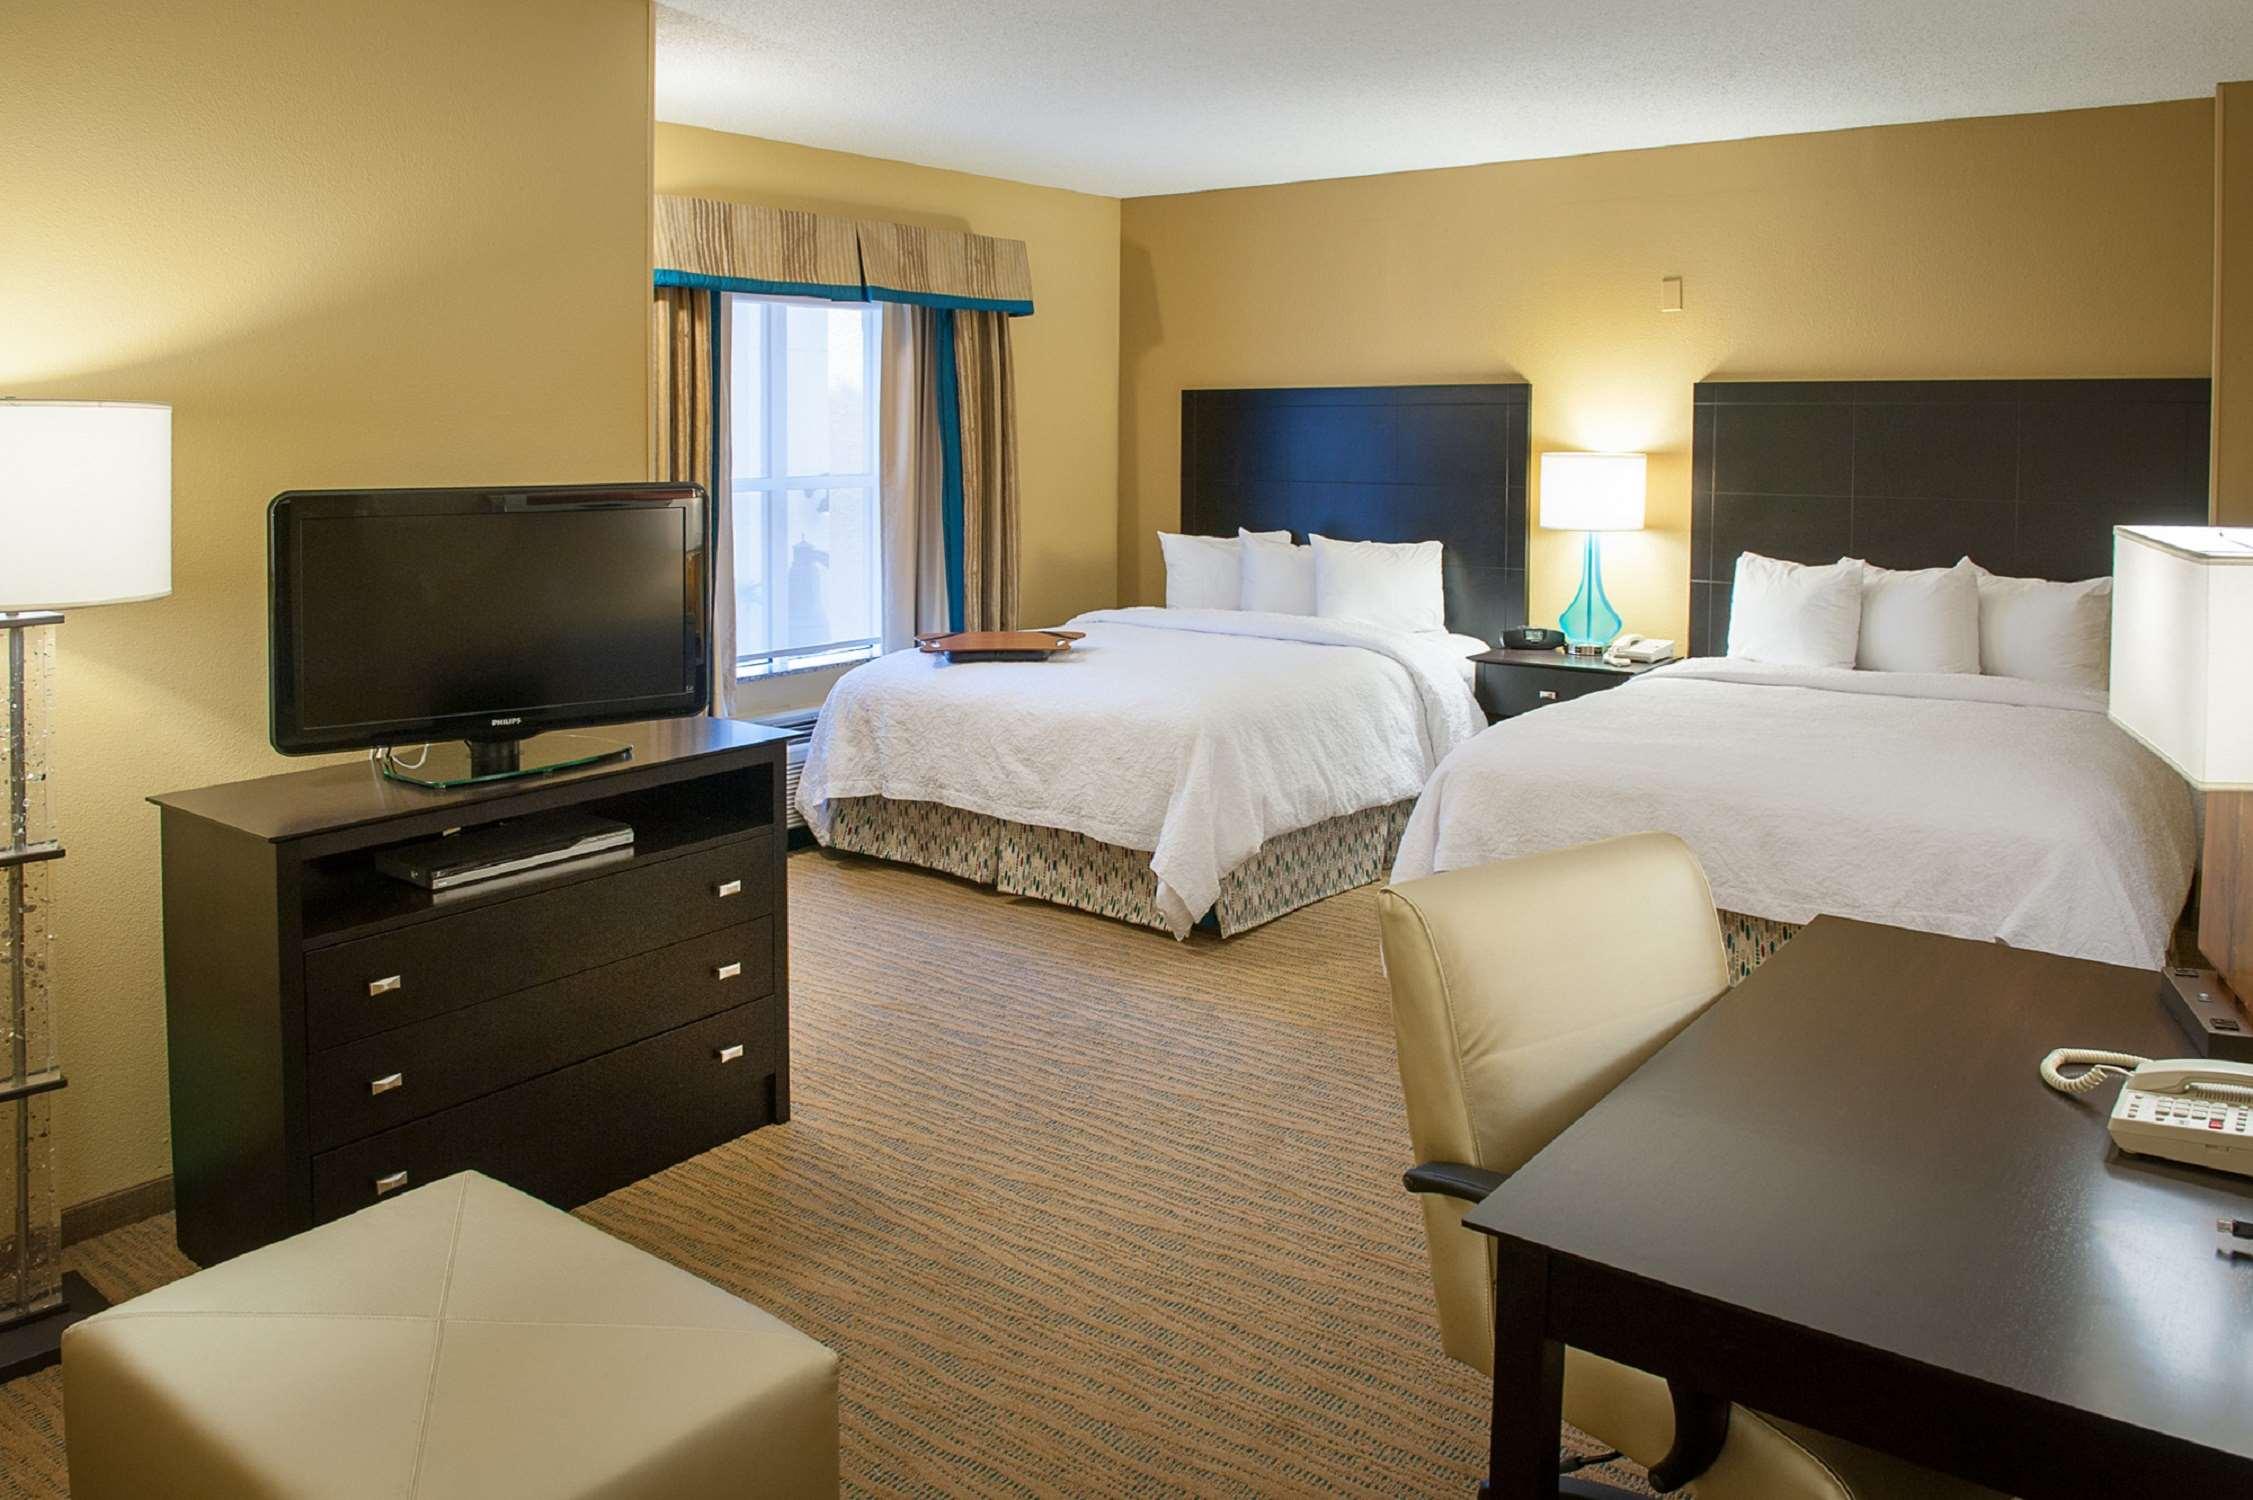 Hampton Inn & Suites St. Petersburg/Downtown image 10